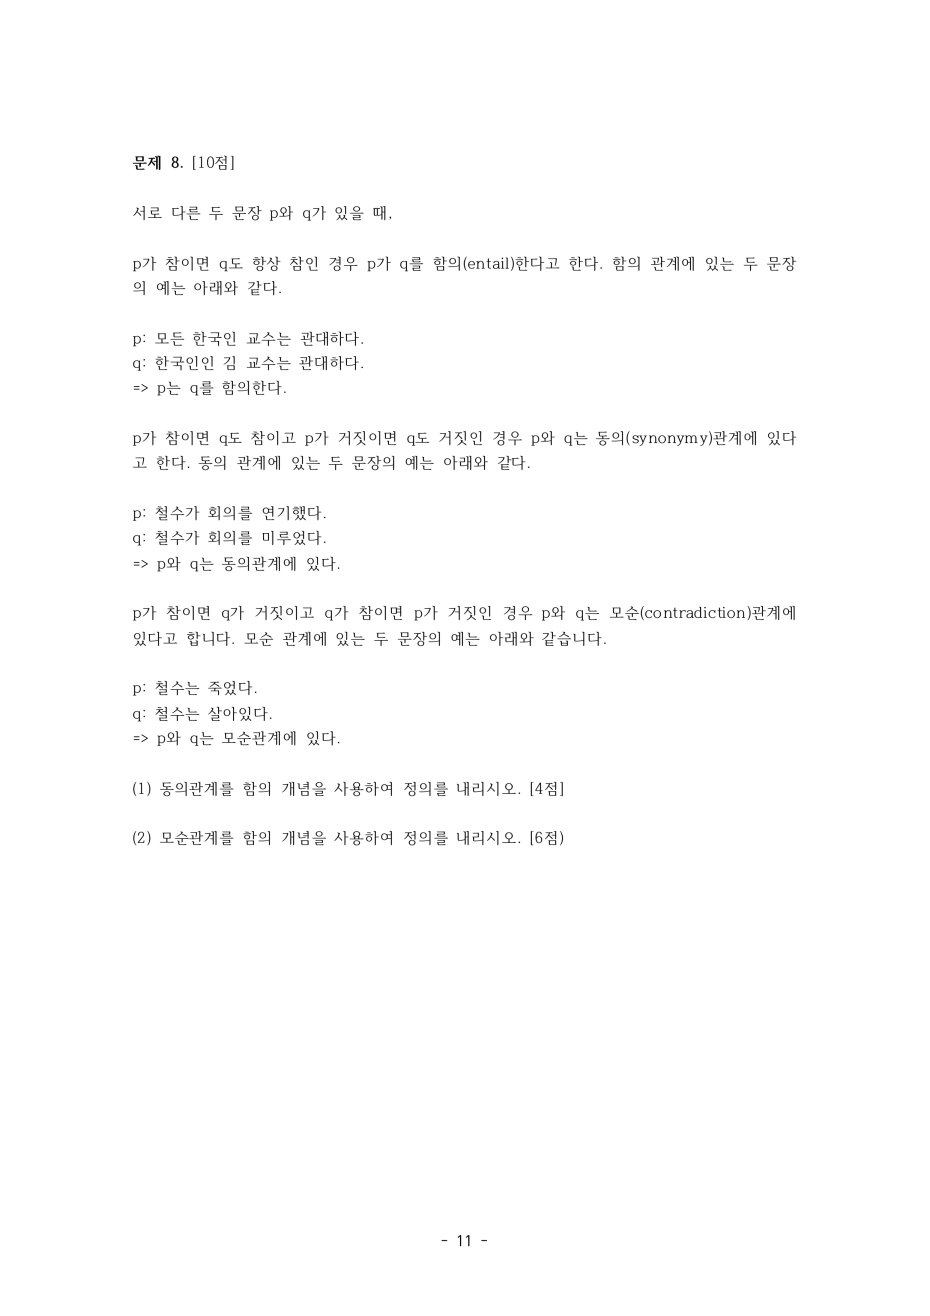 klo2018 11-11